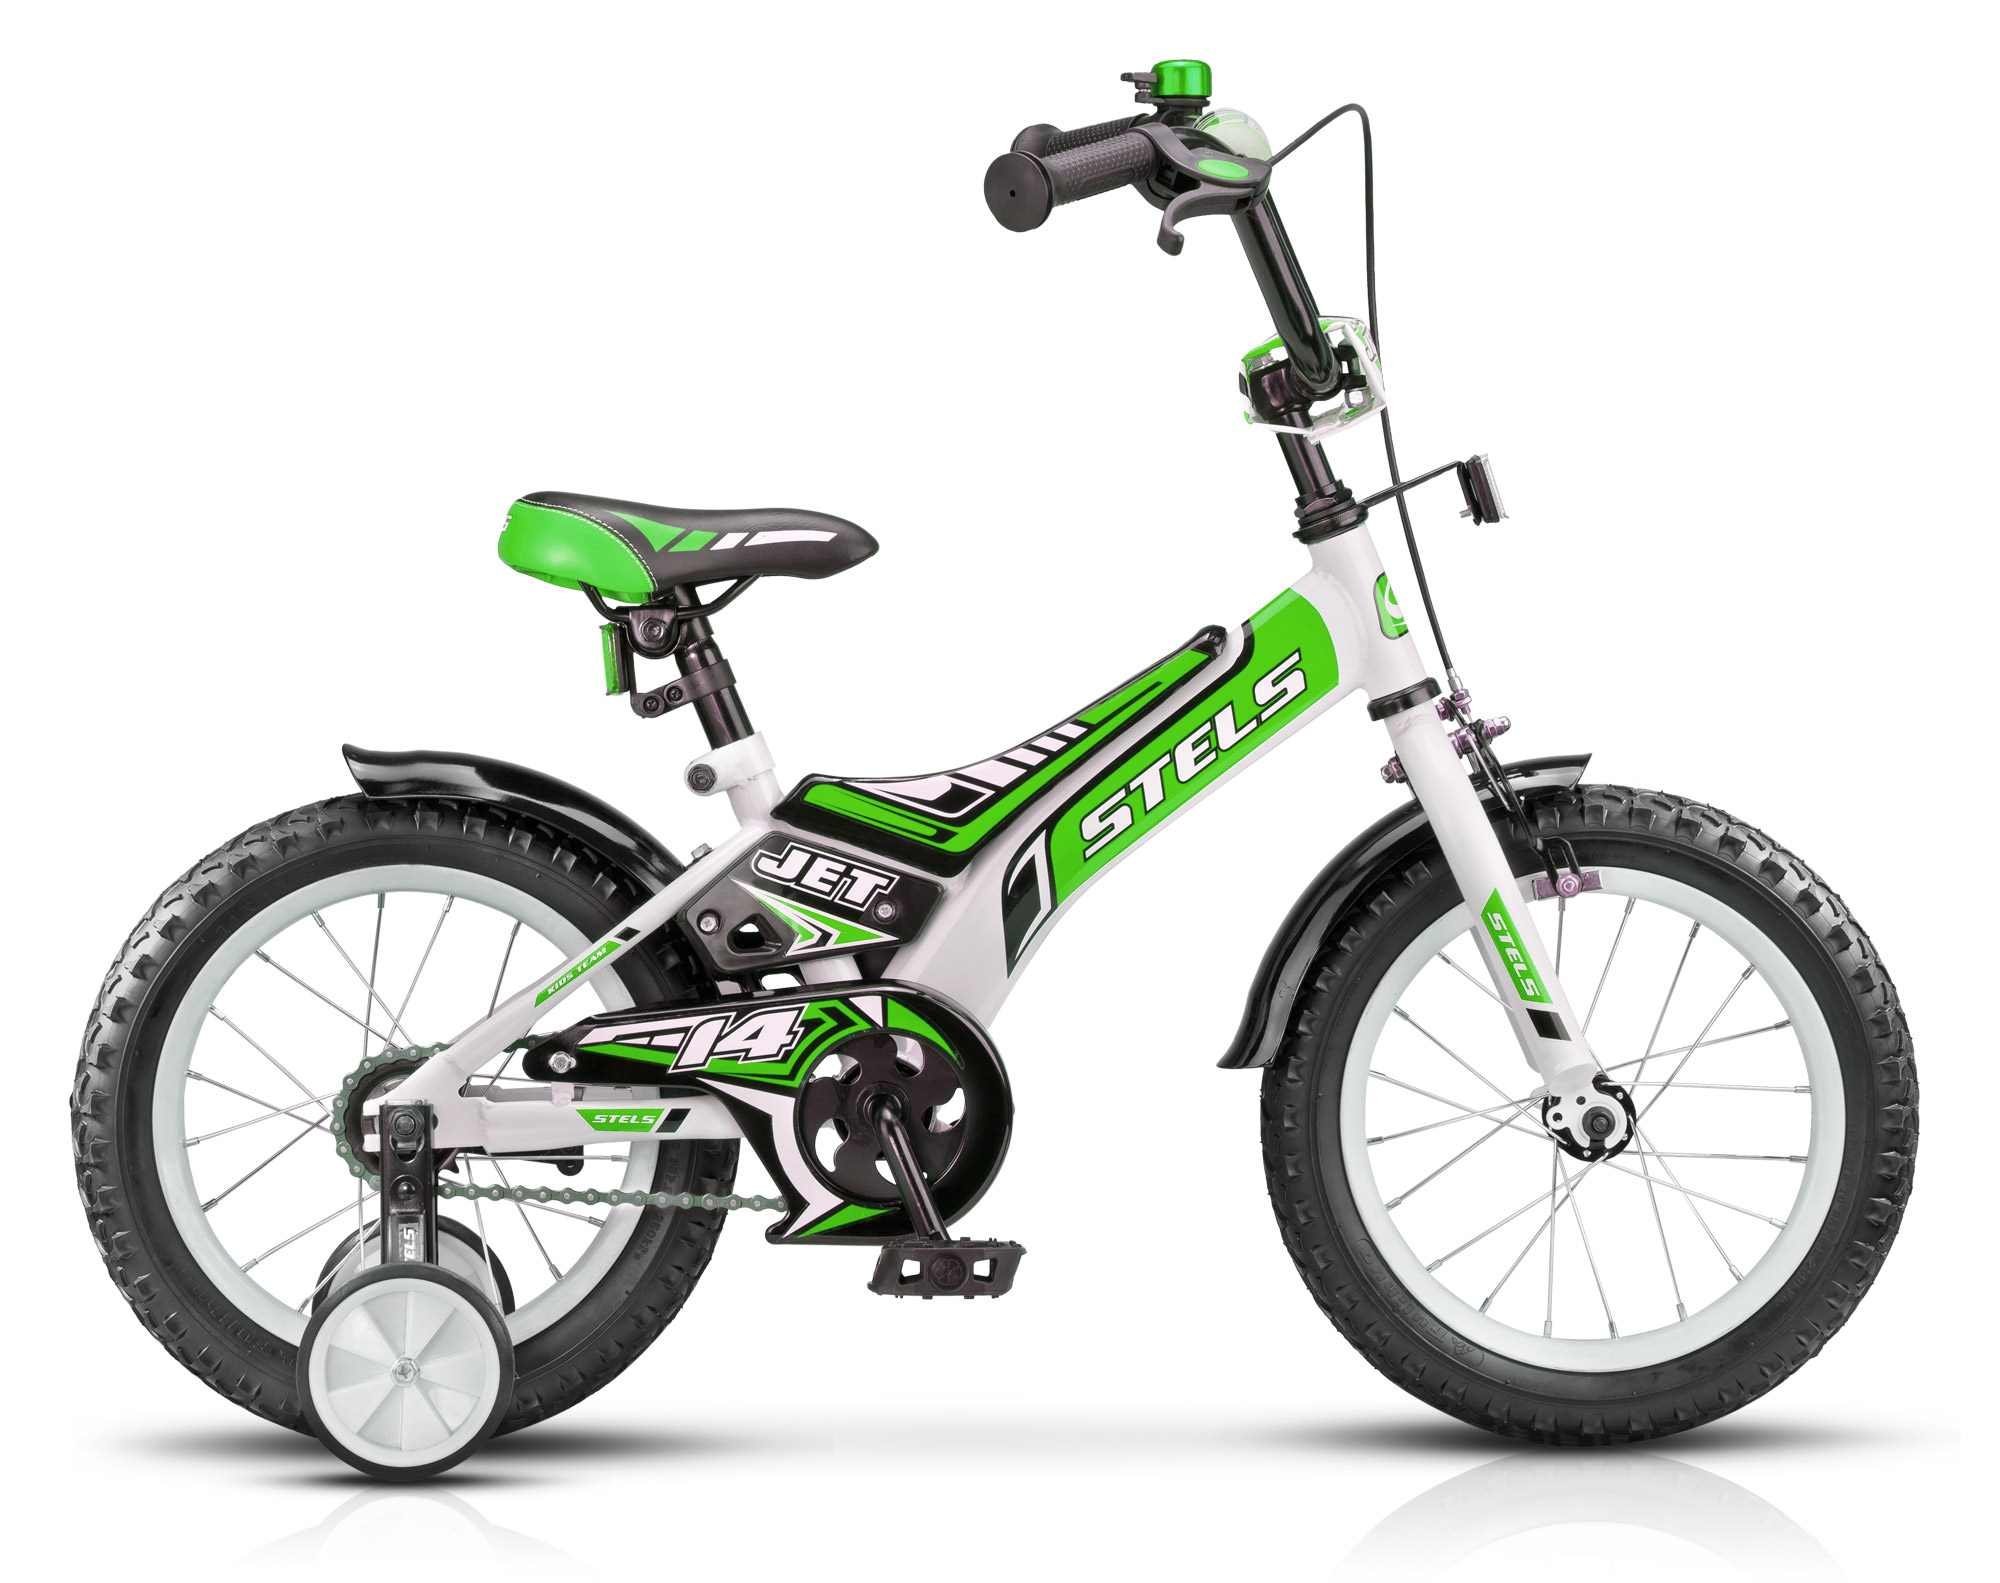 схема сборки велосипеда orion flash